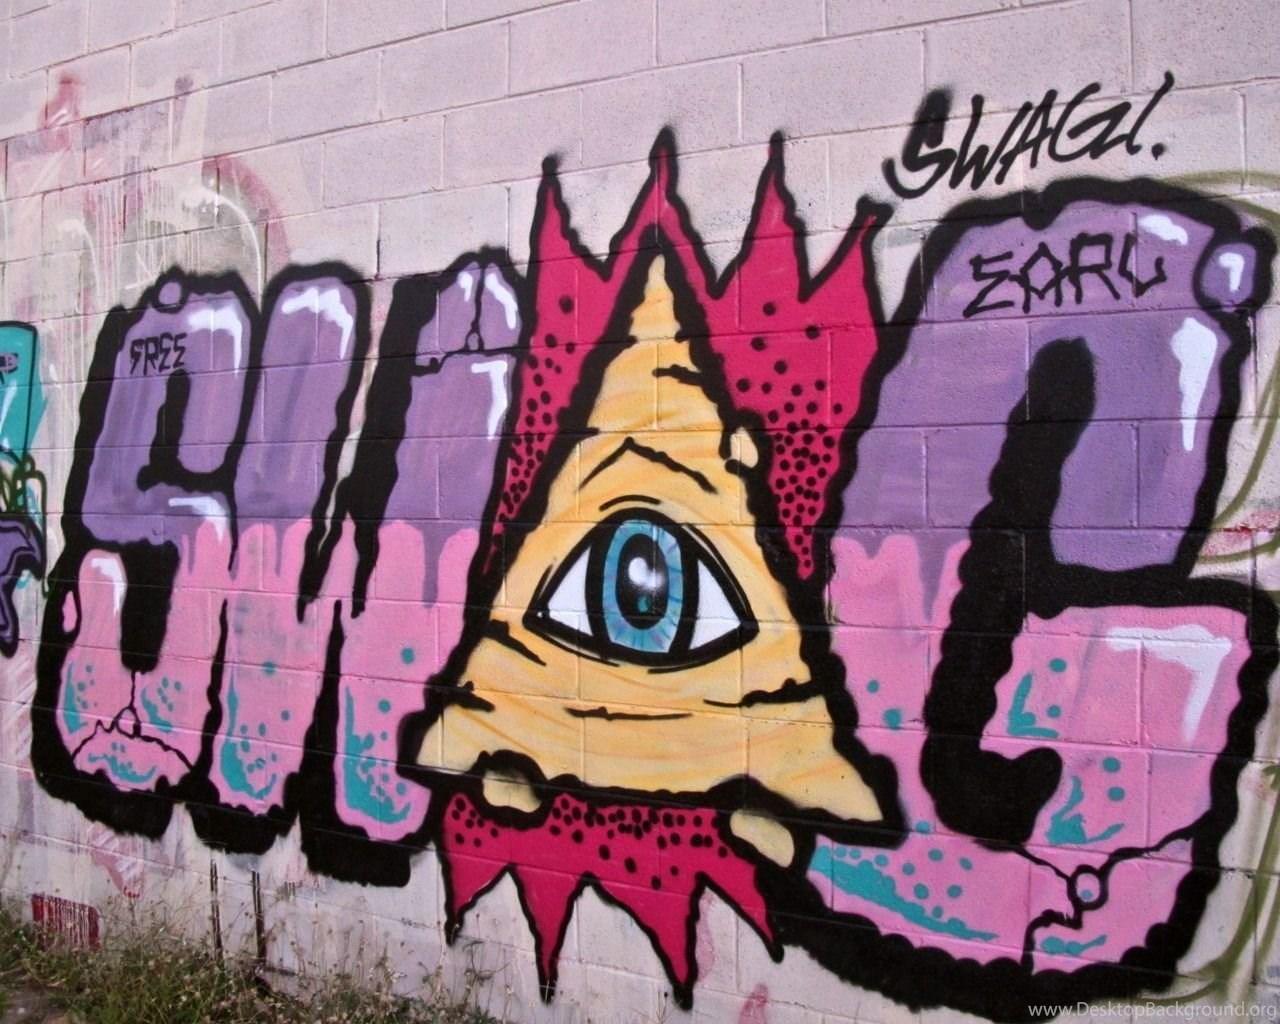 Download Nyc Graffiti Pic Illuminati Swag Free Wallpapers 1280x1025